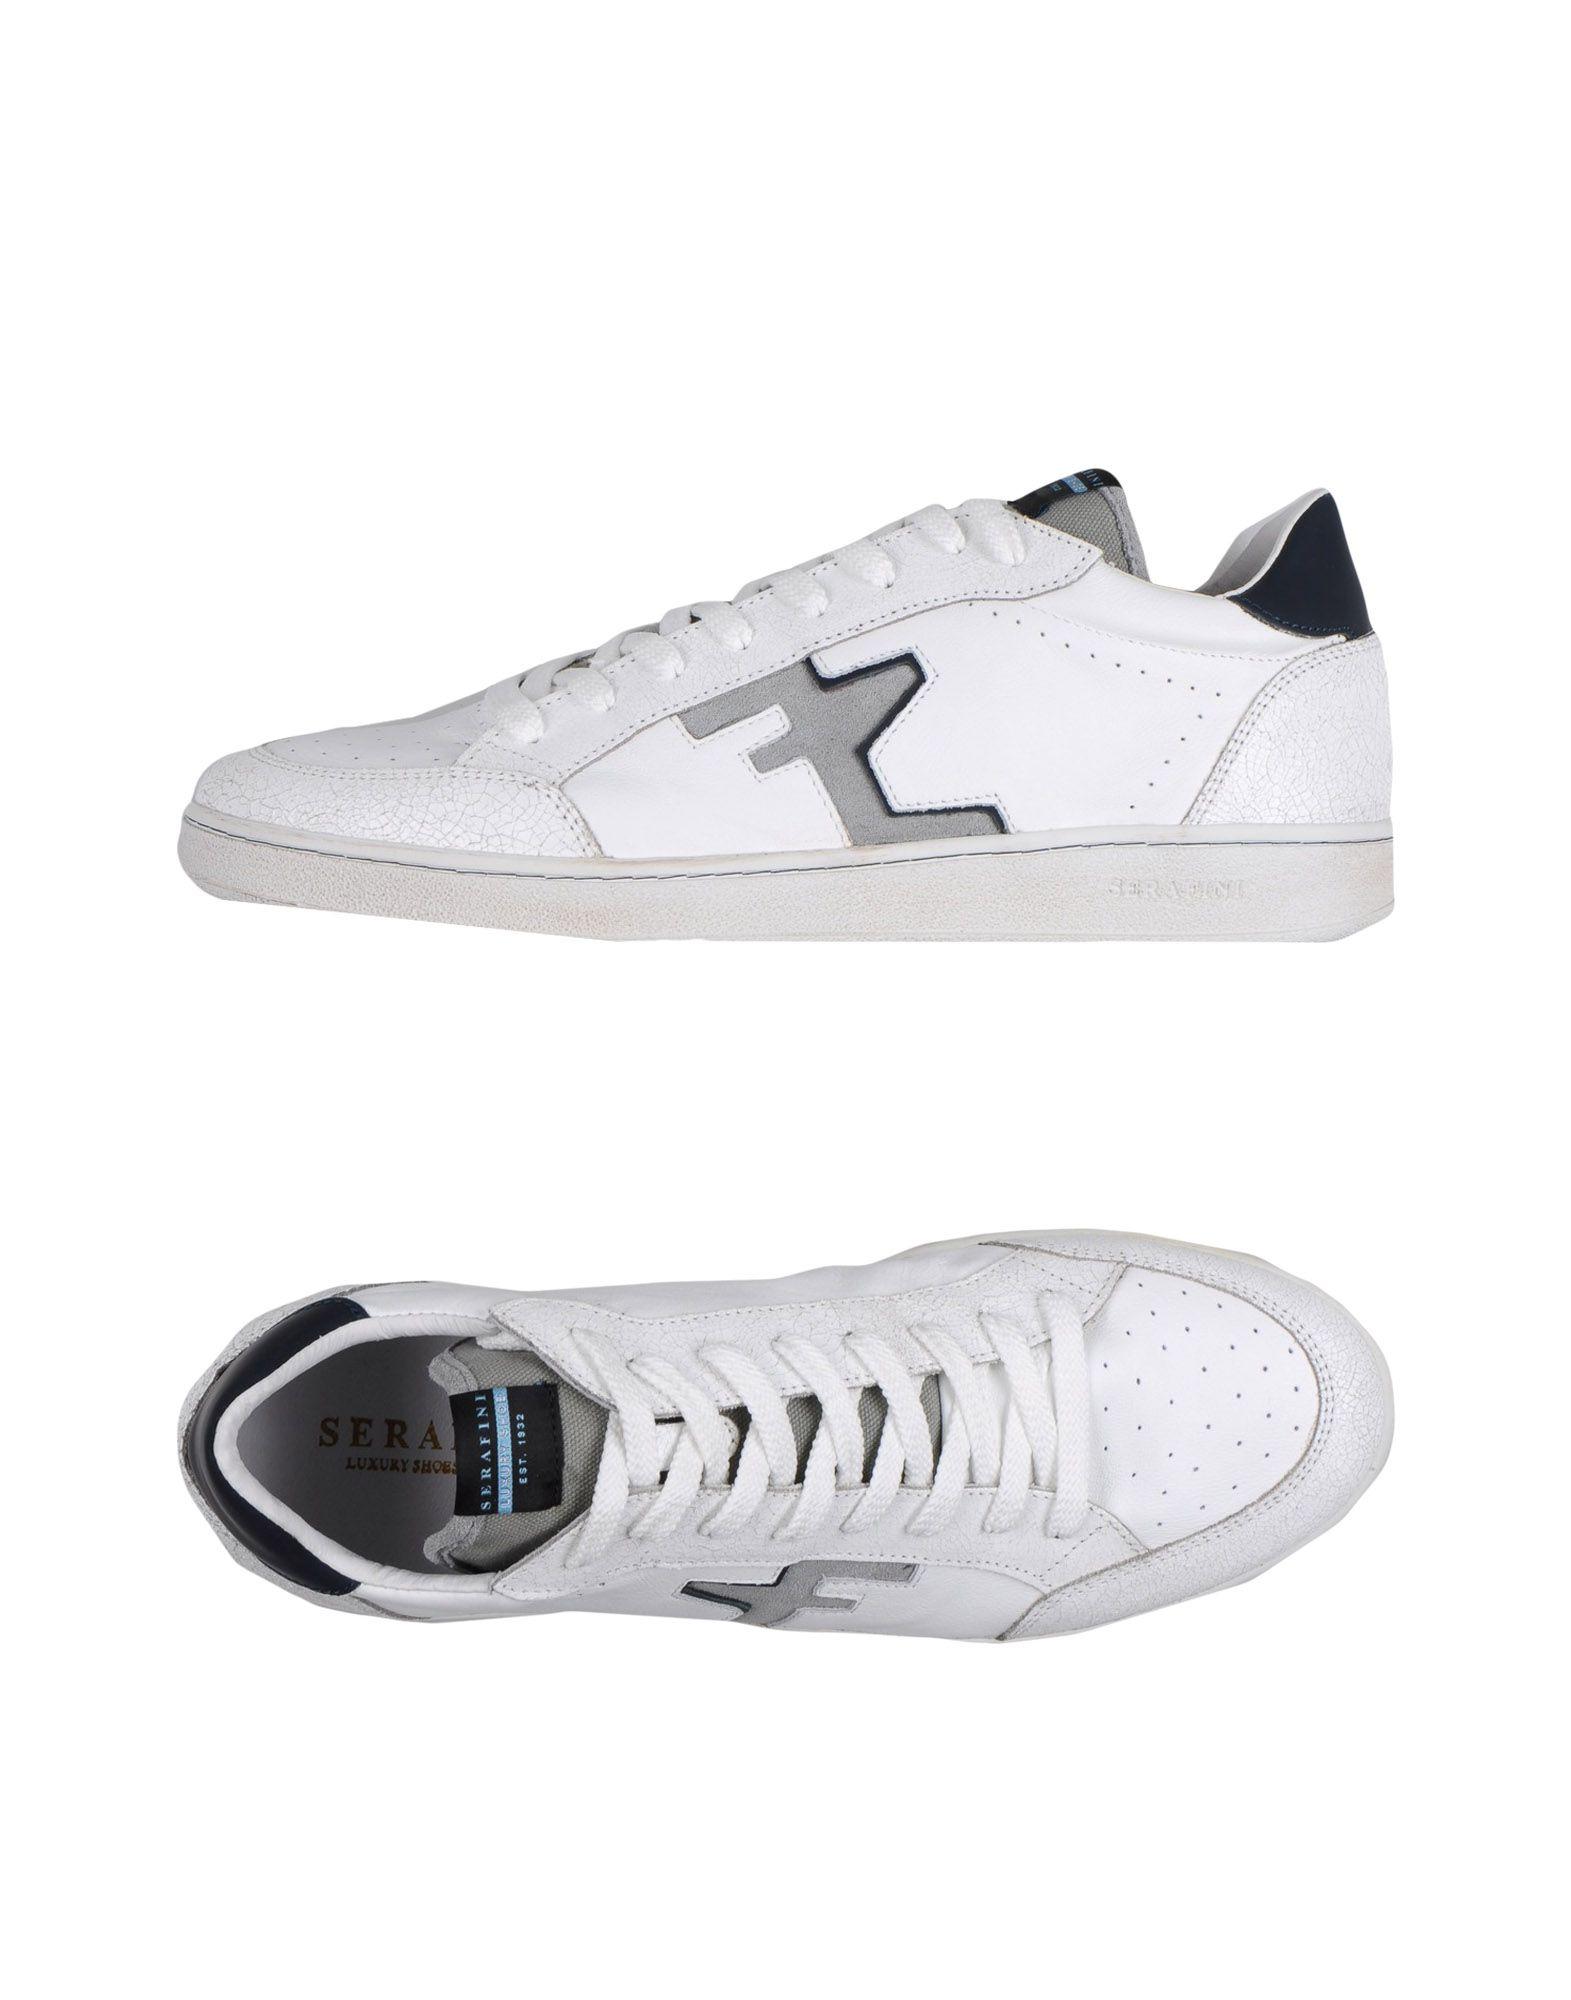 Sneakers Serafini Homme - Sneakers Serafini sur